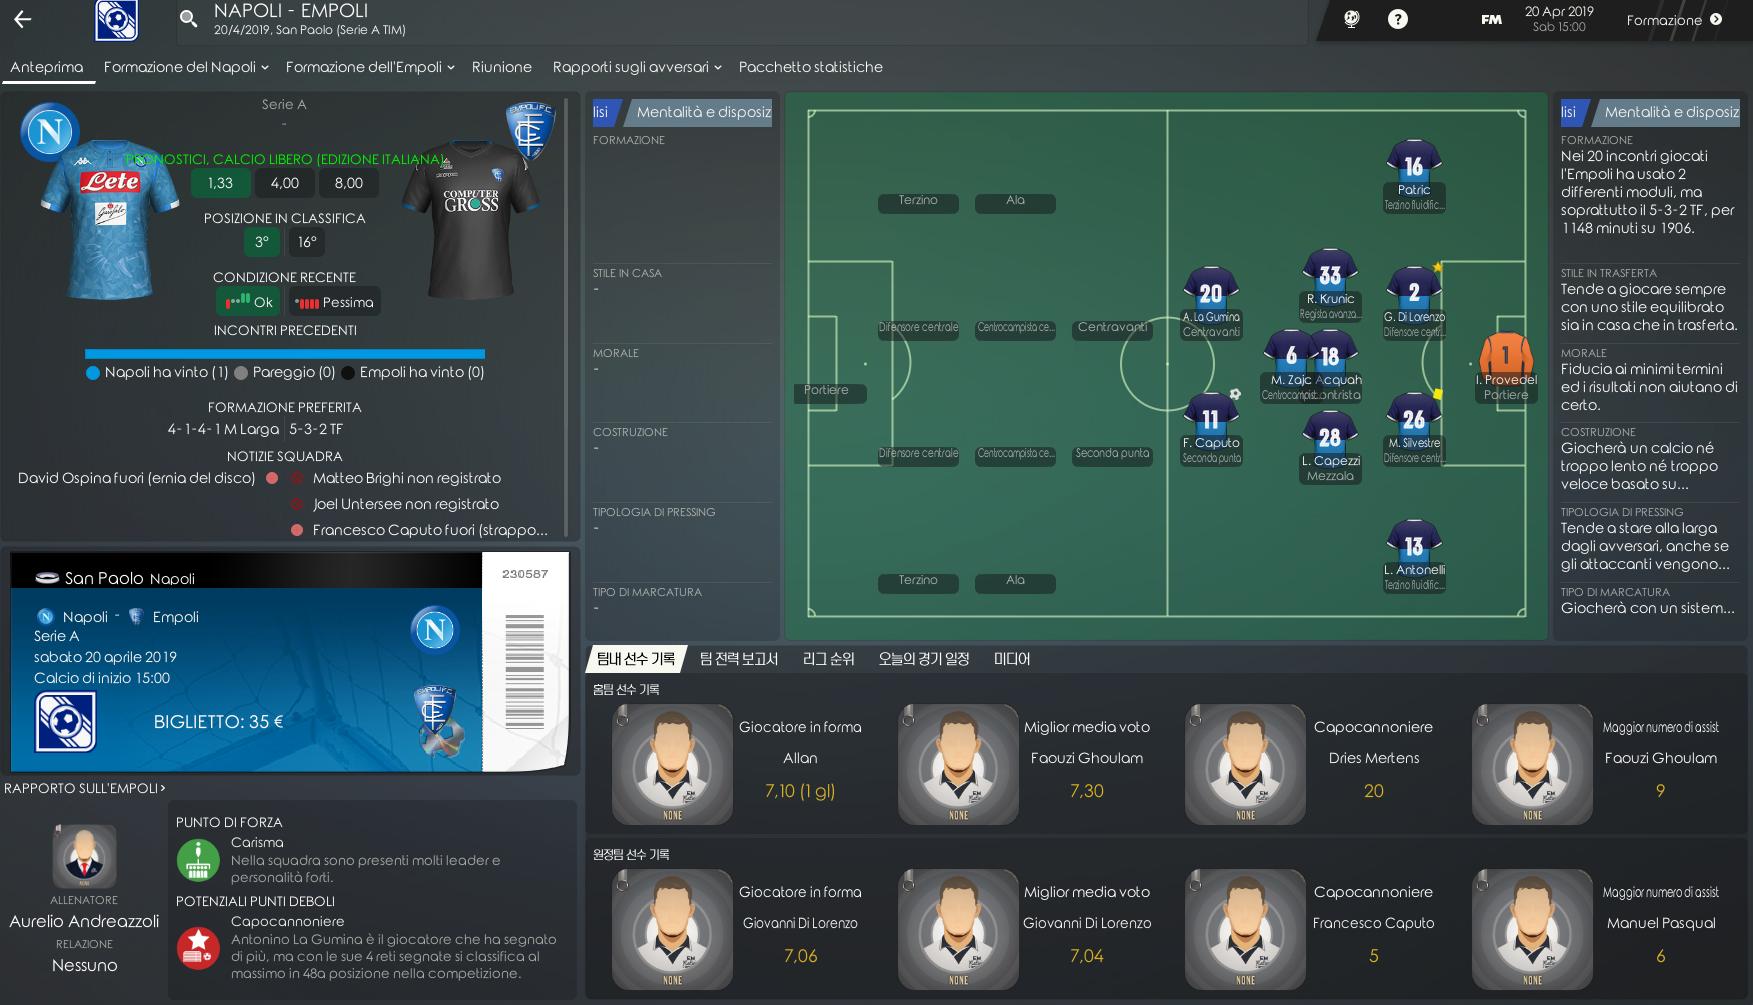 Emon Skin Football Manager 2019 - Parte 2